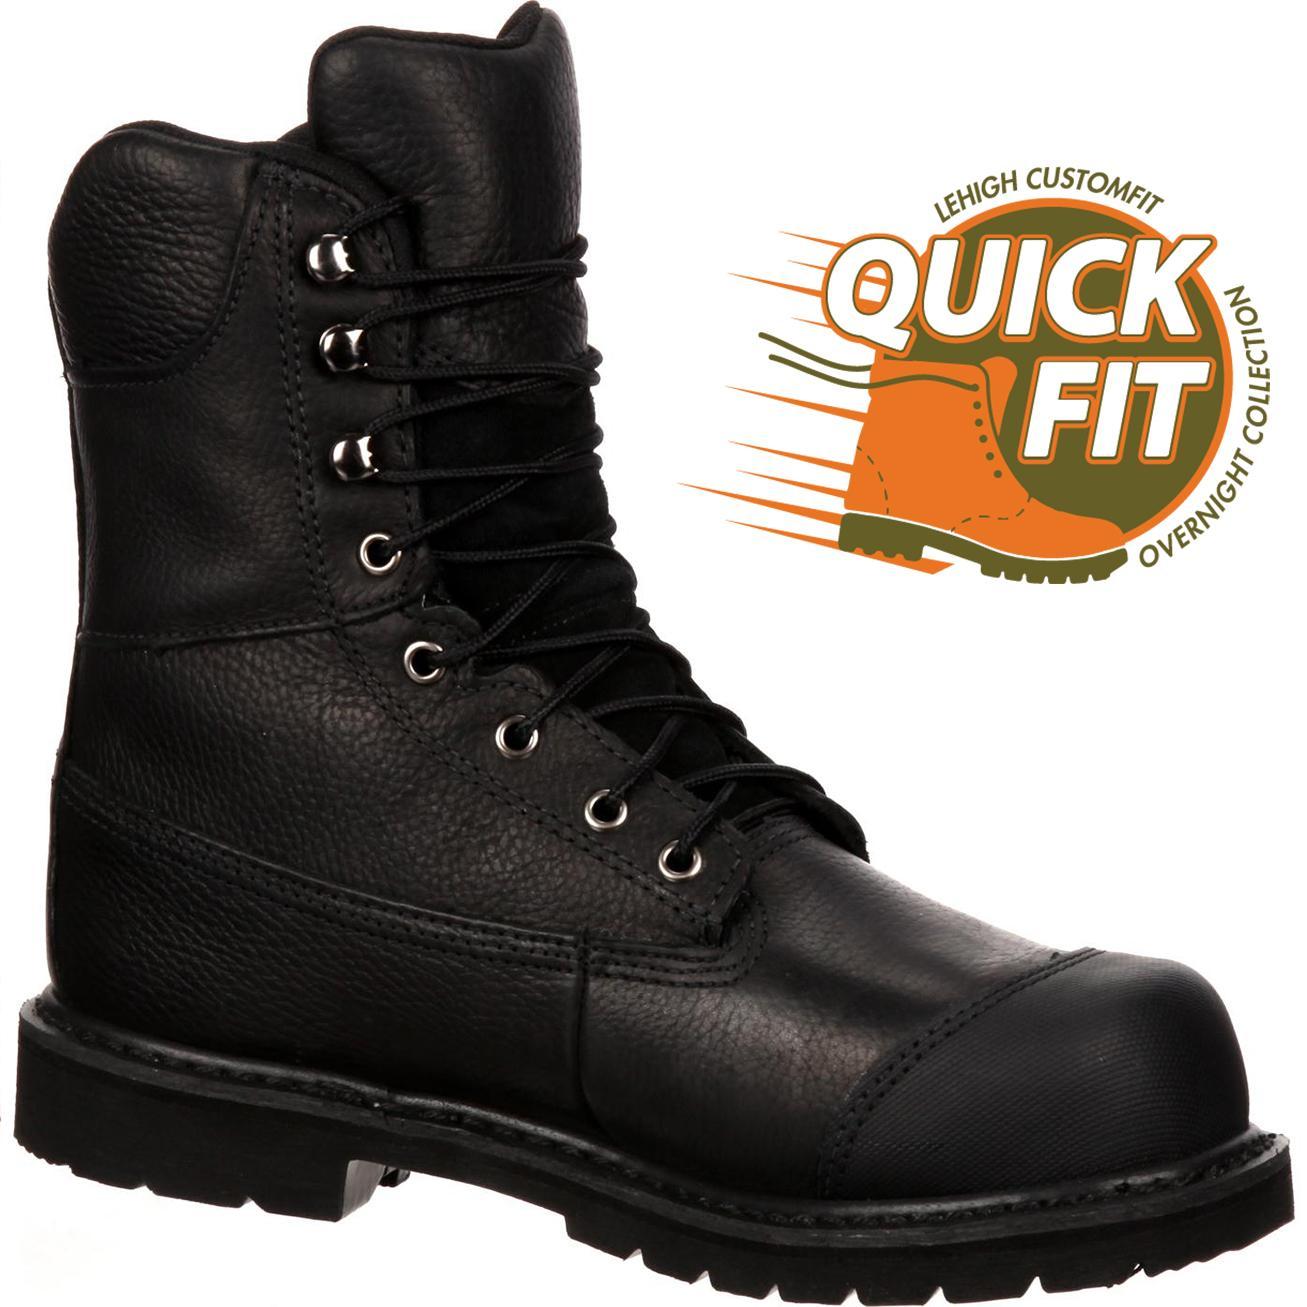 Lehigh Steel Toe Work Shoes